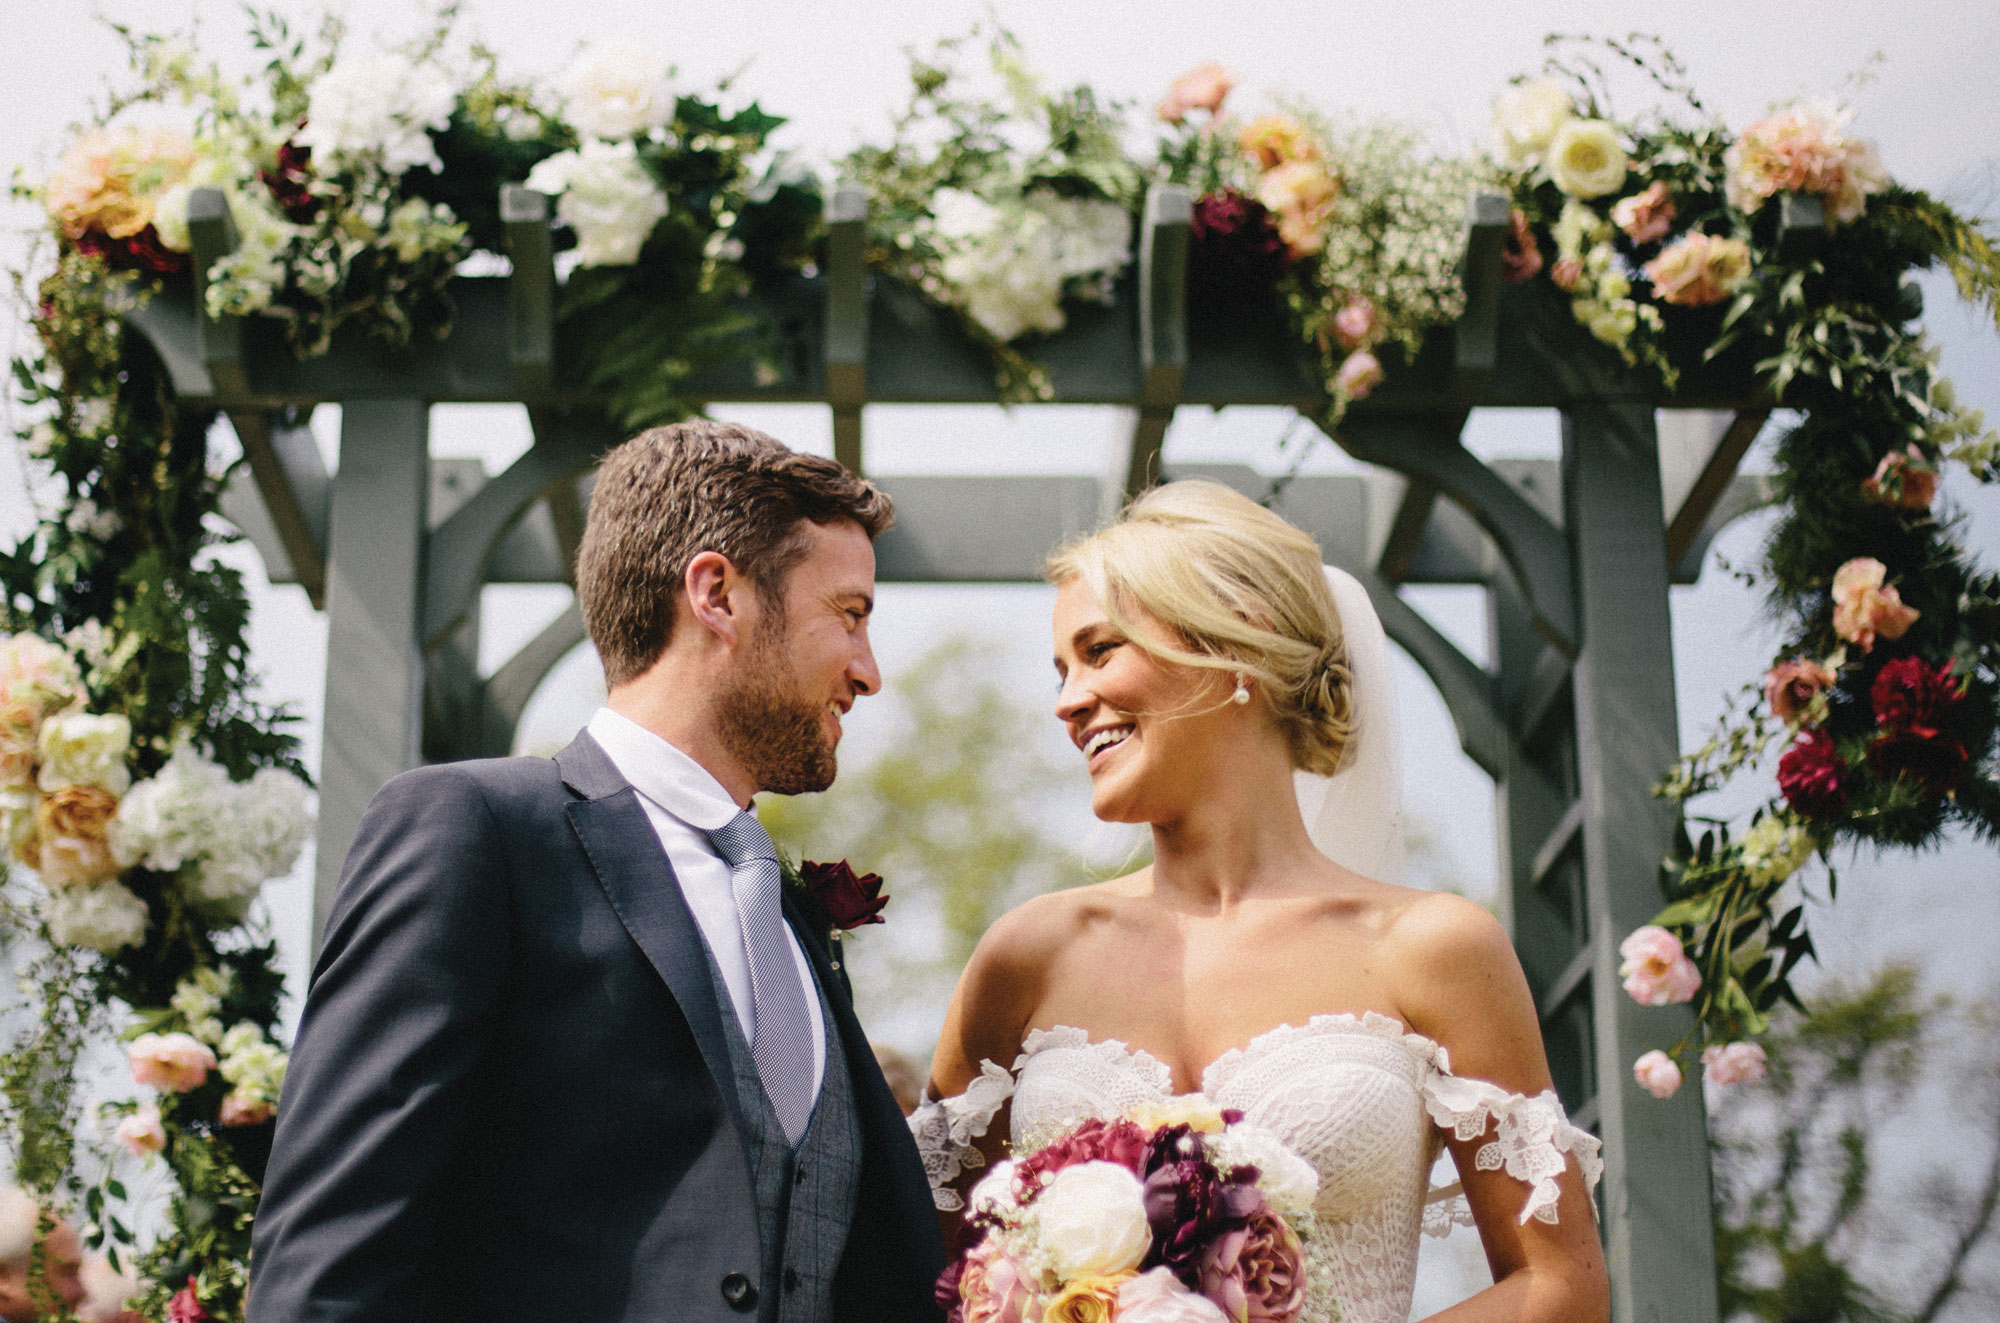 Out-door-wedding-ceremony-tullyveery-irelandjpg